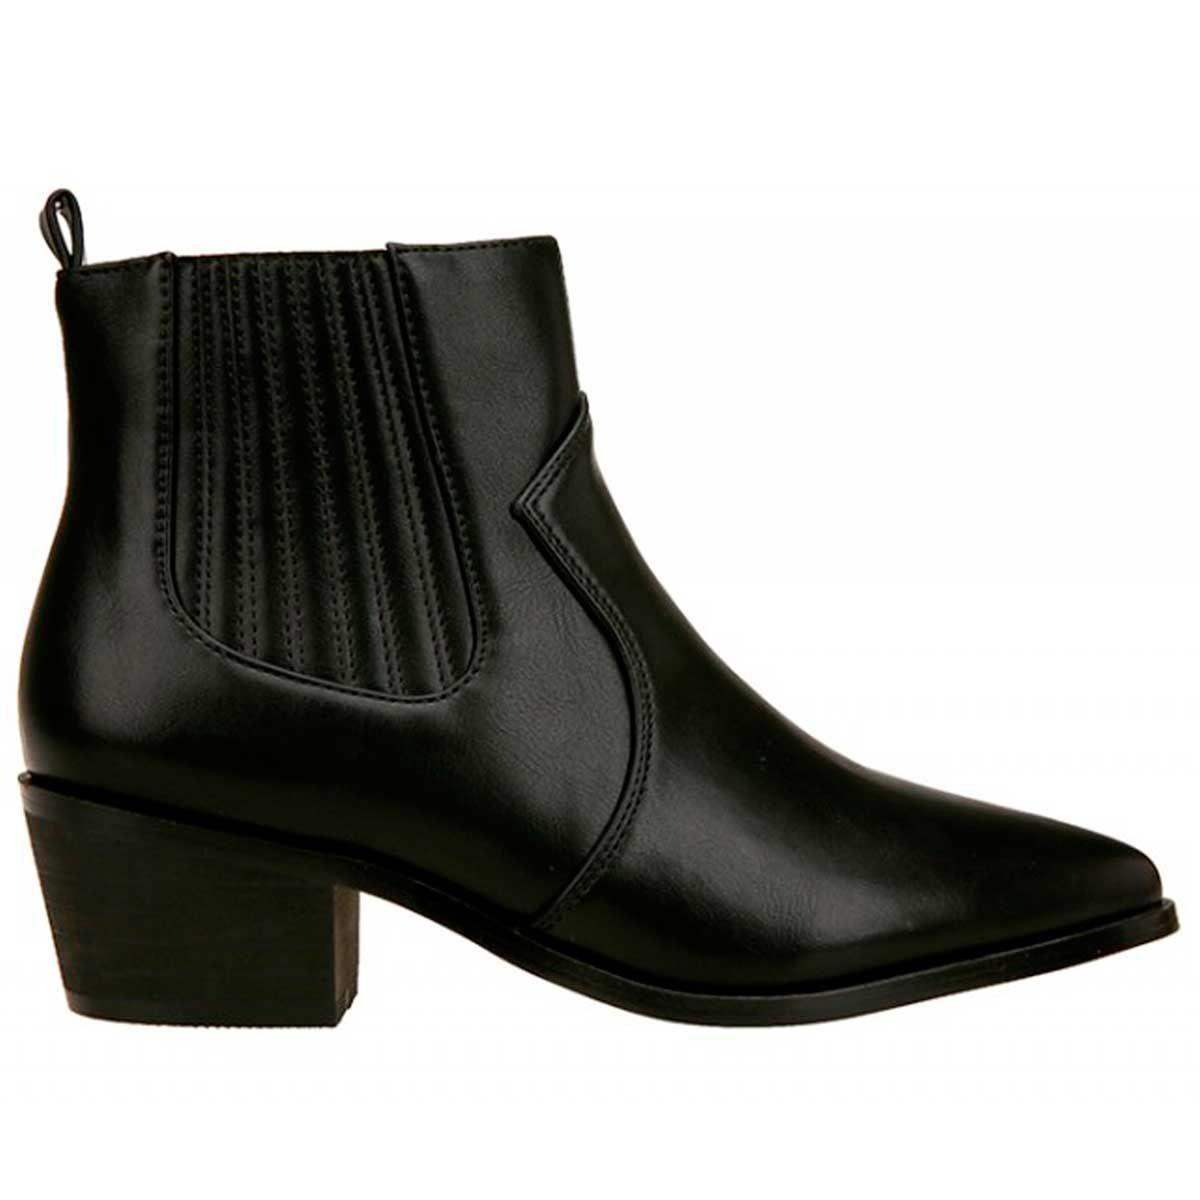 Montevita Western Ankle Boot in Black